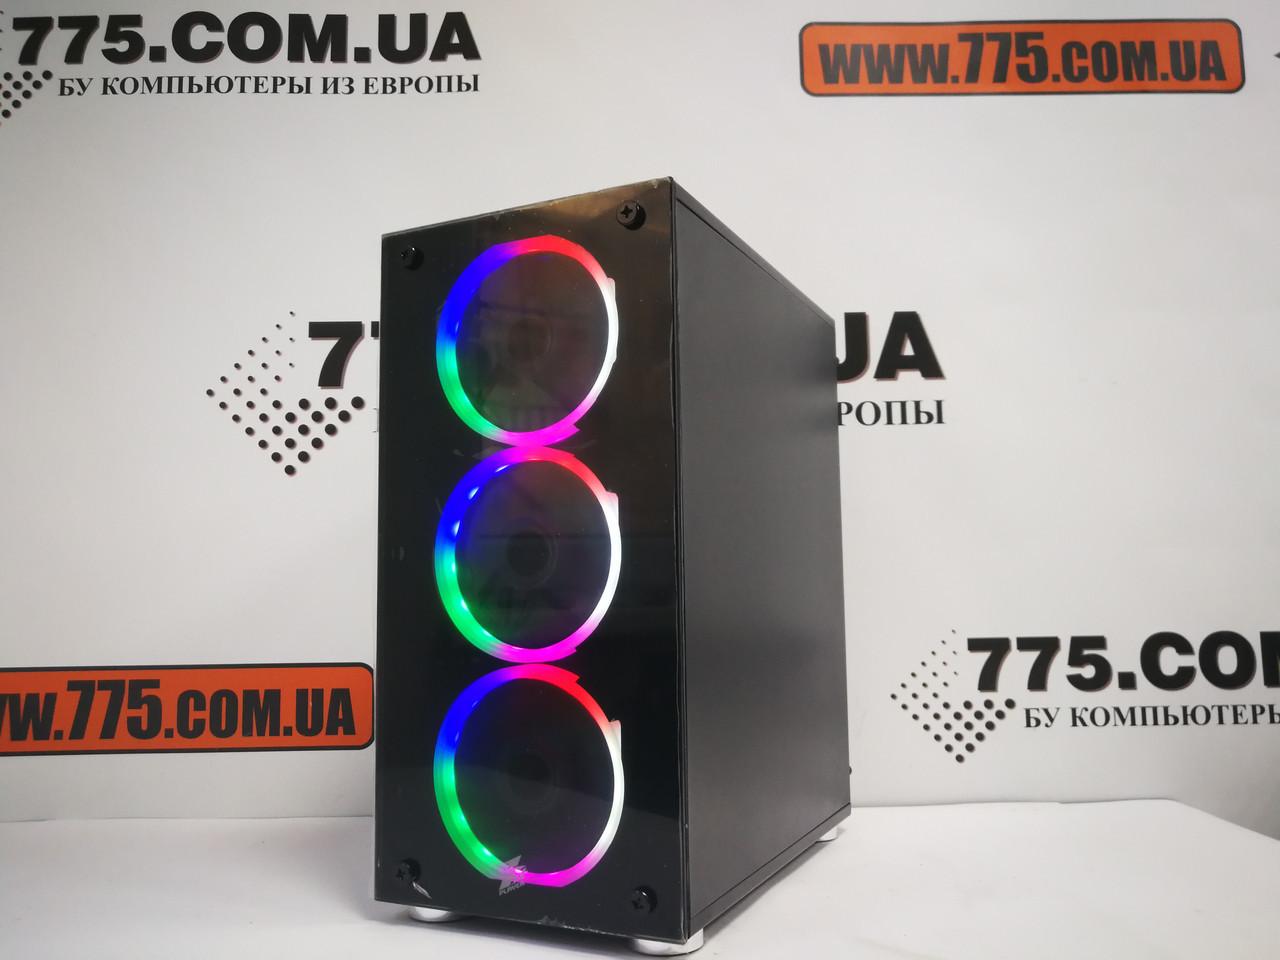 Игровой компьютер Intel Core i5-6500 3.6GHz, RAM 16ГБ, SSD 240ГБ, 500ГБ HDD, RX 580 8GB